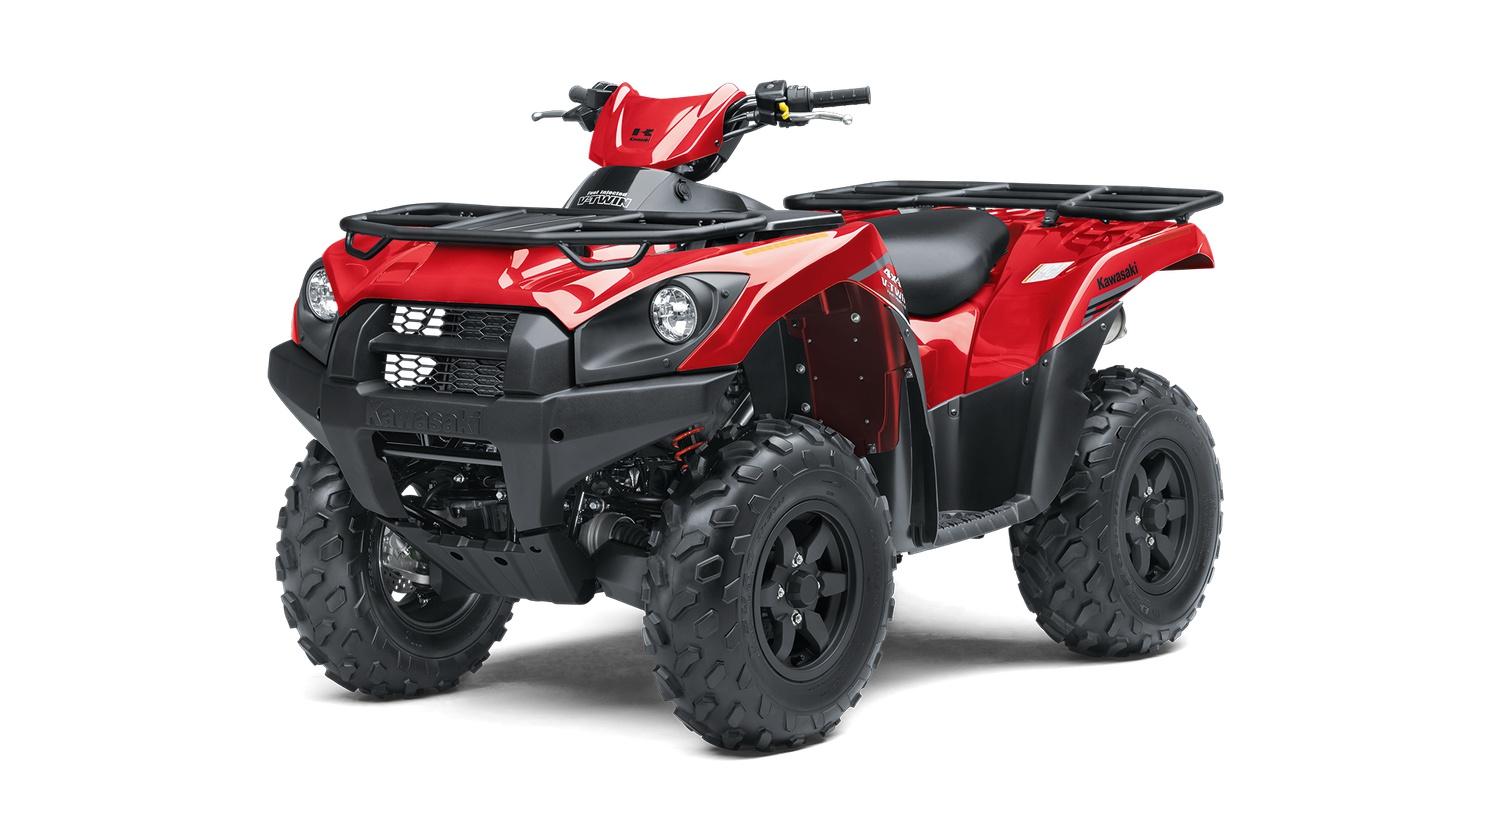 Kawasaki BRUTE FORCE 750 4x4i Rouge Pétard 2020